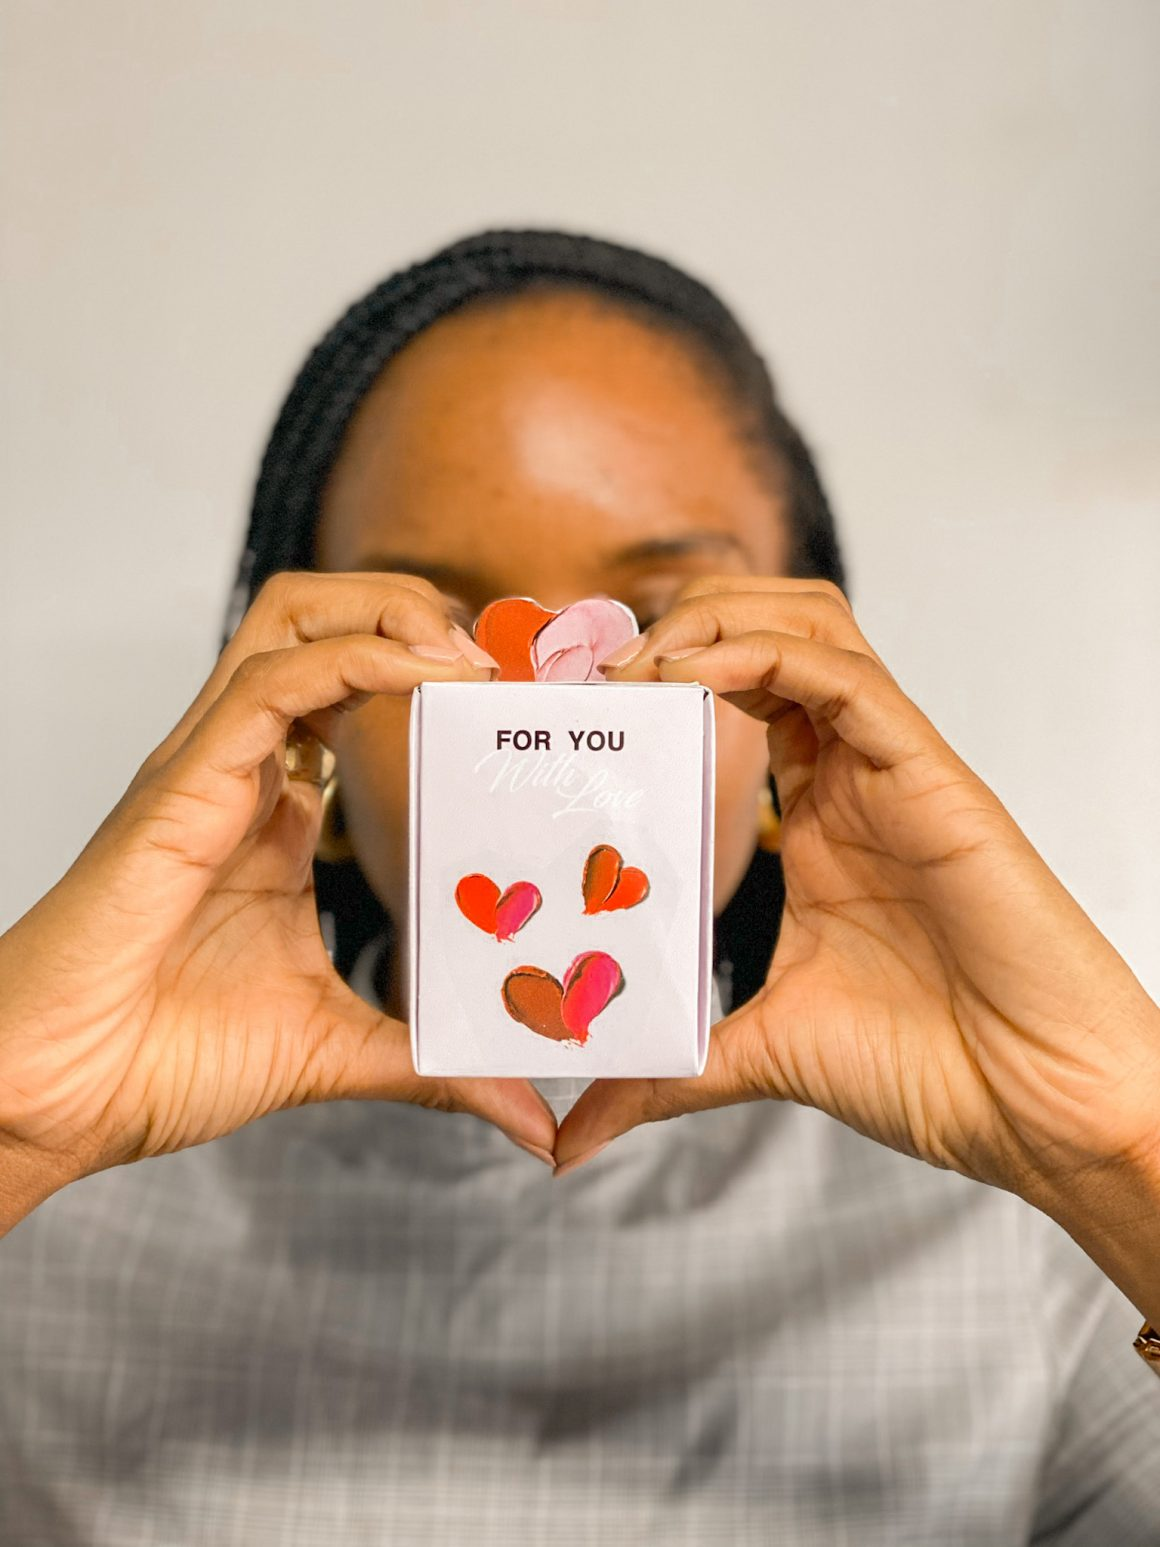 Why You Should Make Selfcare A Habit + A #SelfcareChallenge